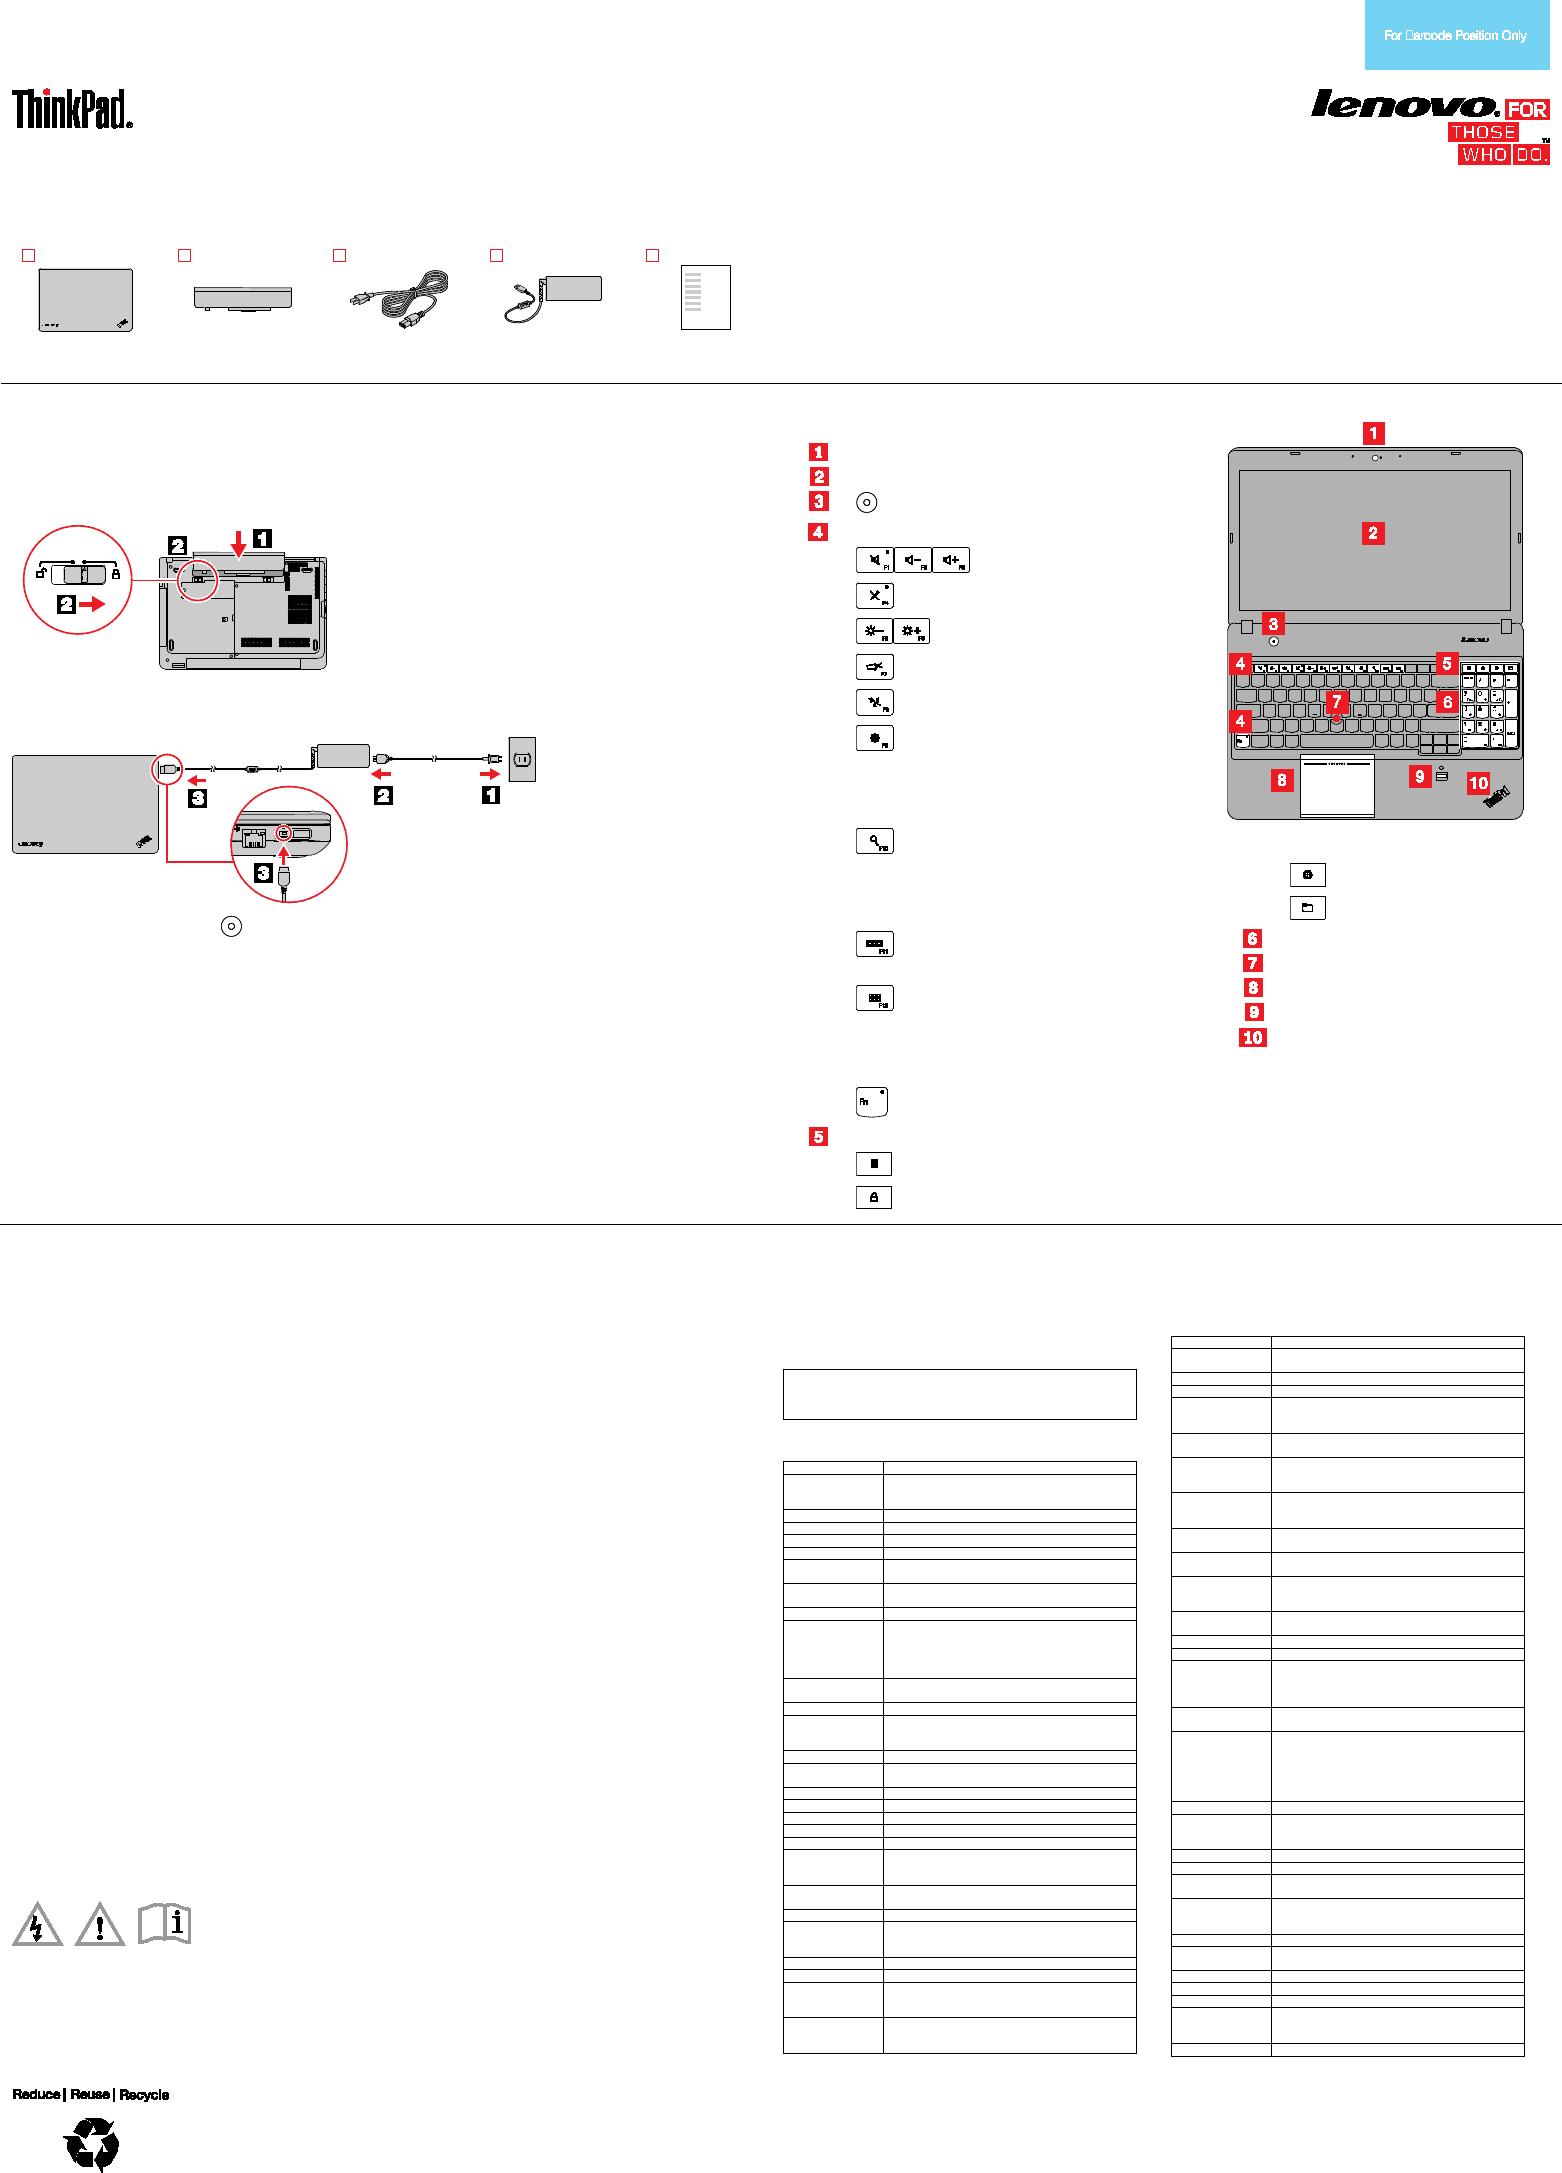 Lenovo E440 E540 Swsg En Sp40F28926 ThinkPad And User Manual